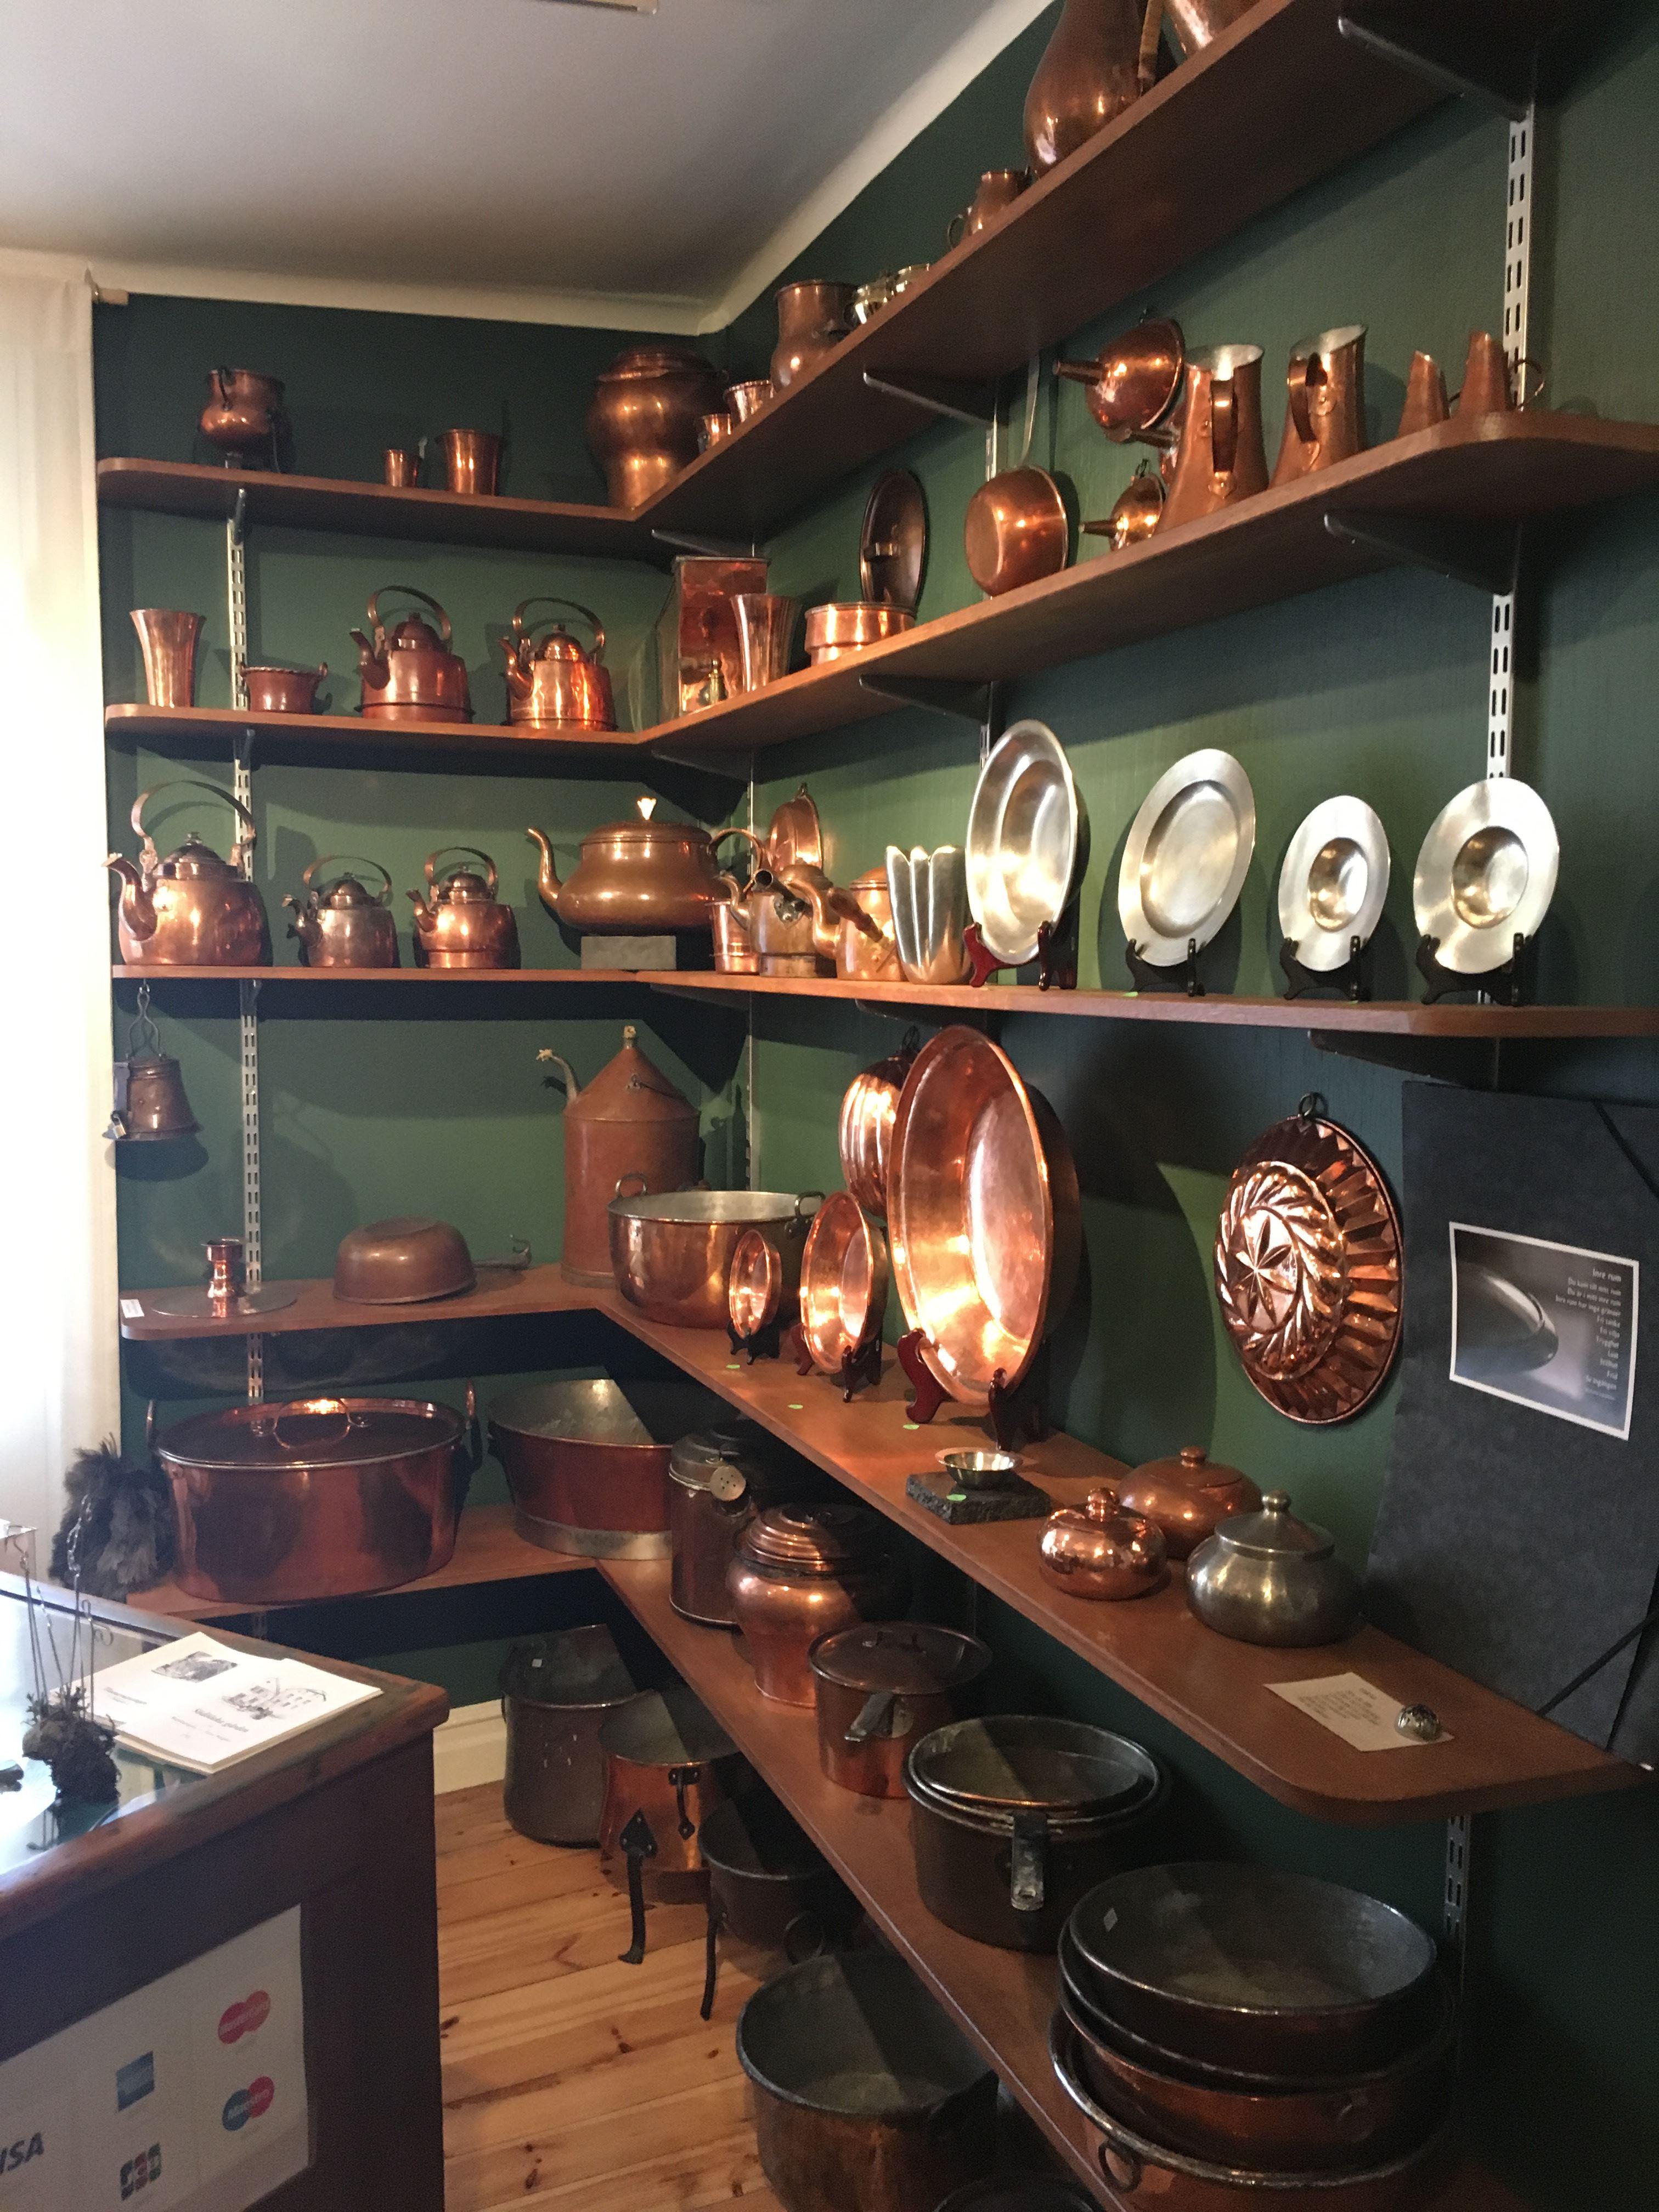 Coppersmith Museum